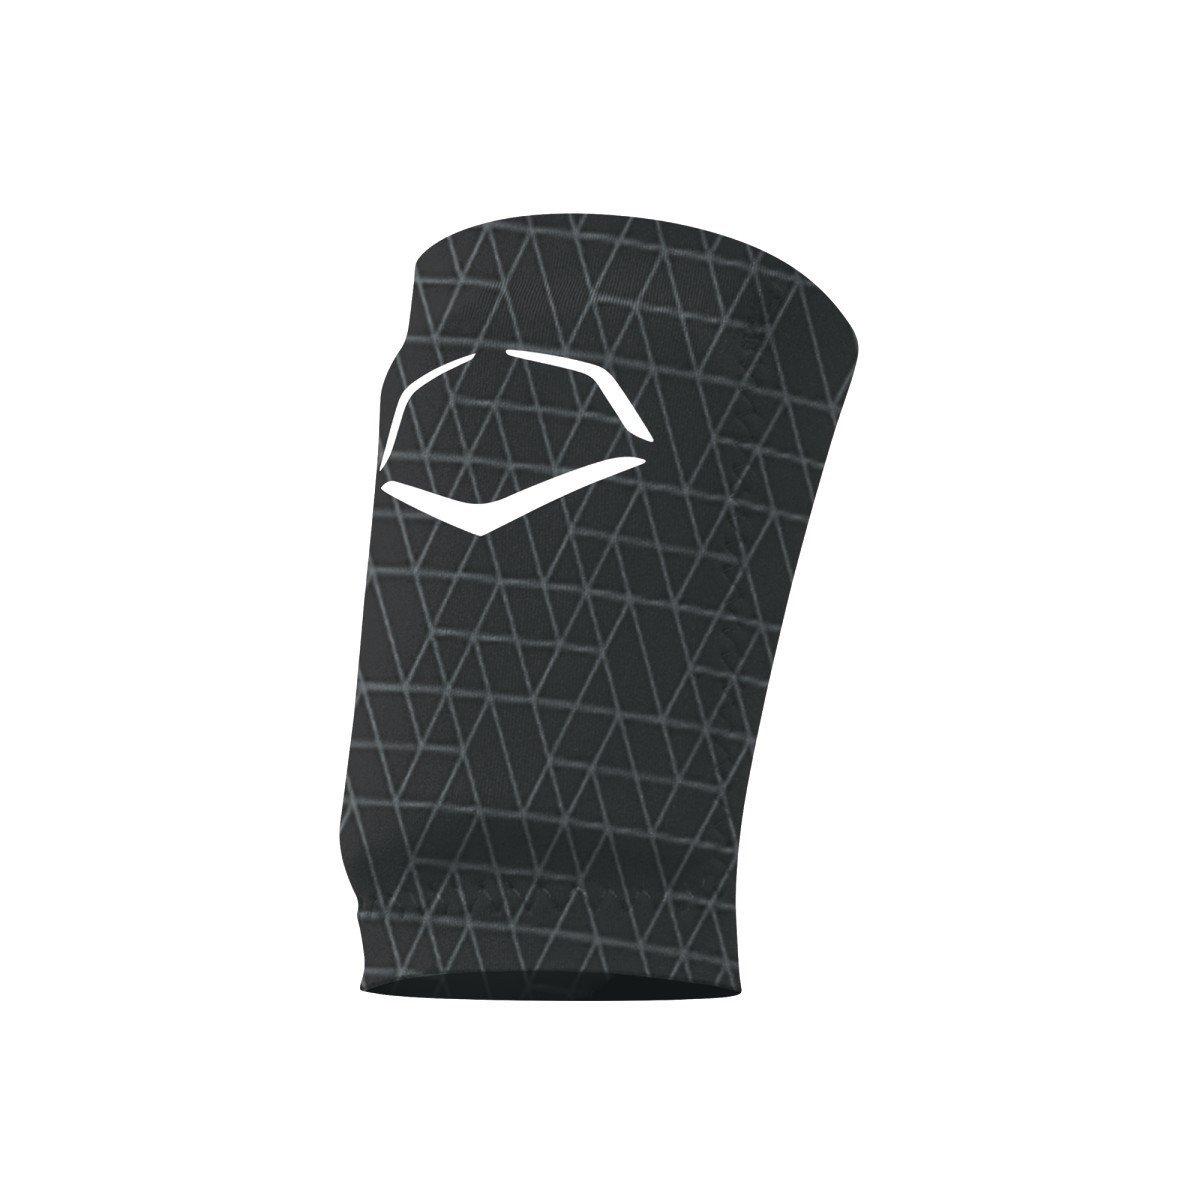 Evocharge Protective Wrist Guard